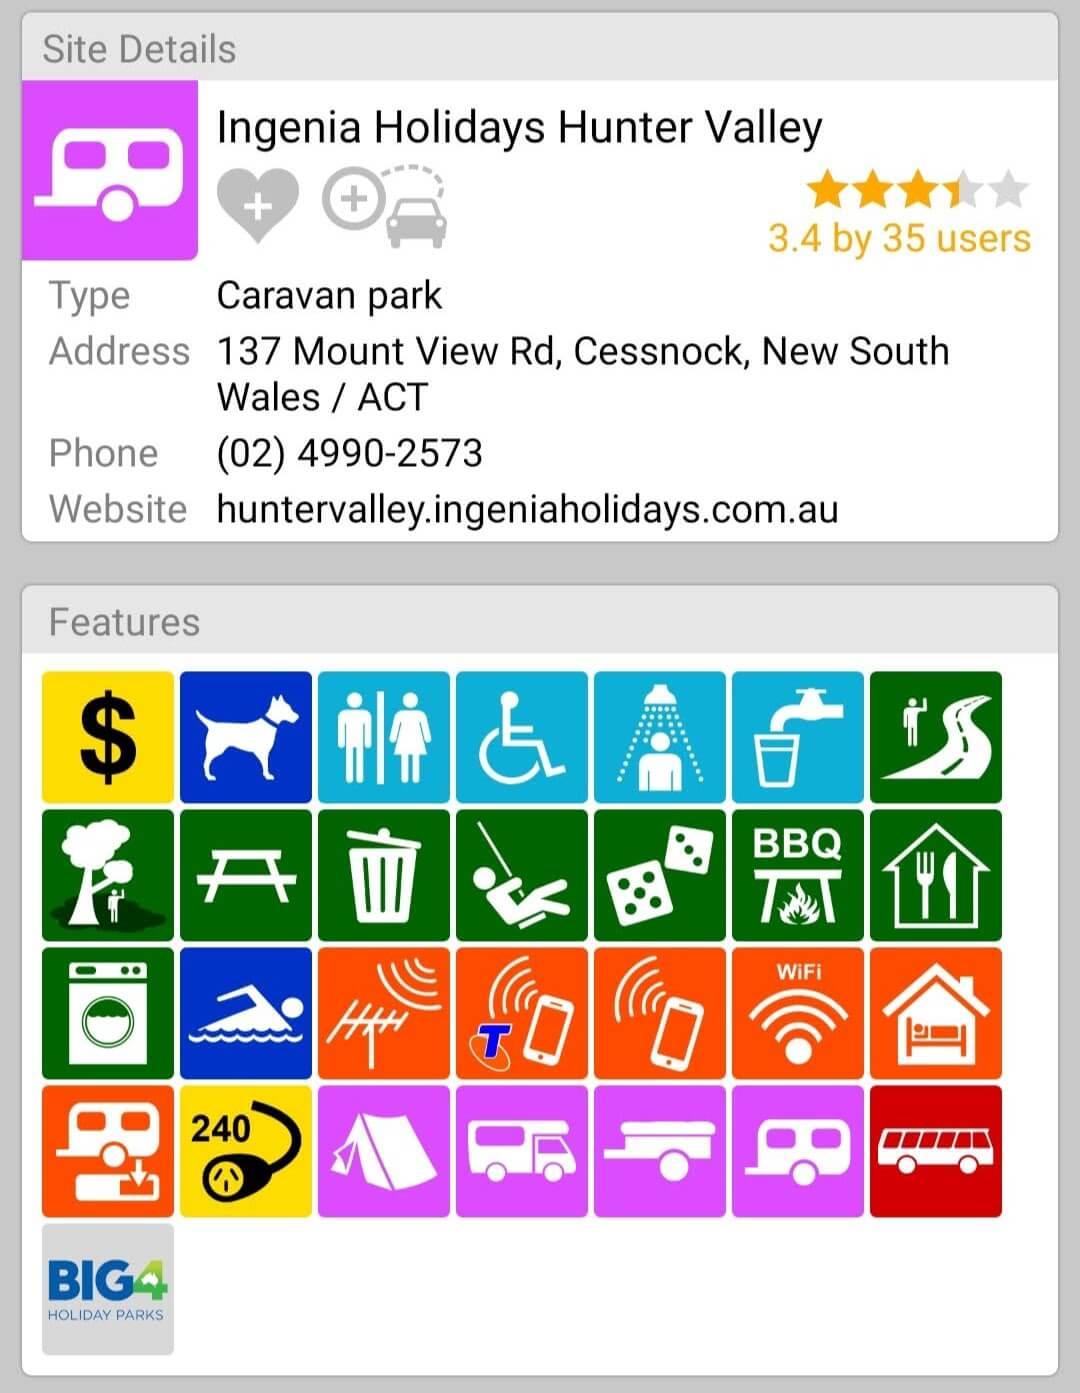 Ingenia Holidays Hunter Valley